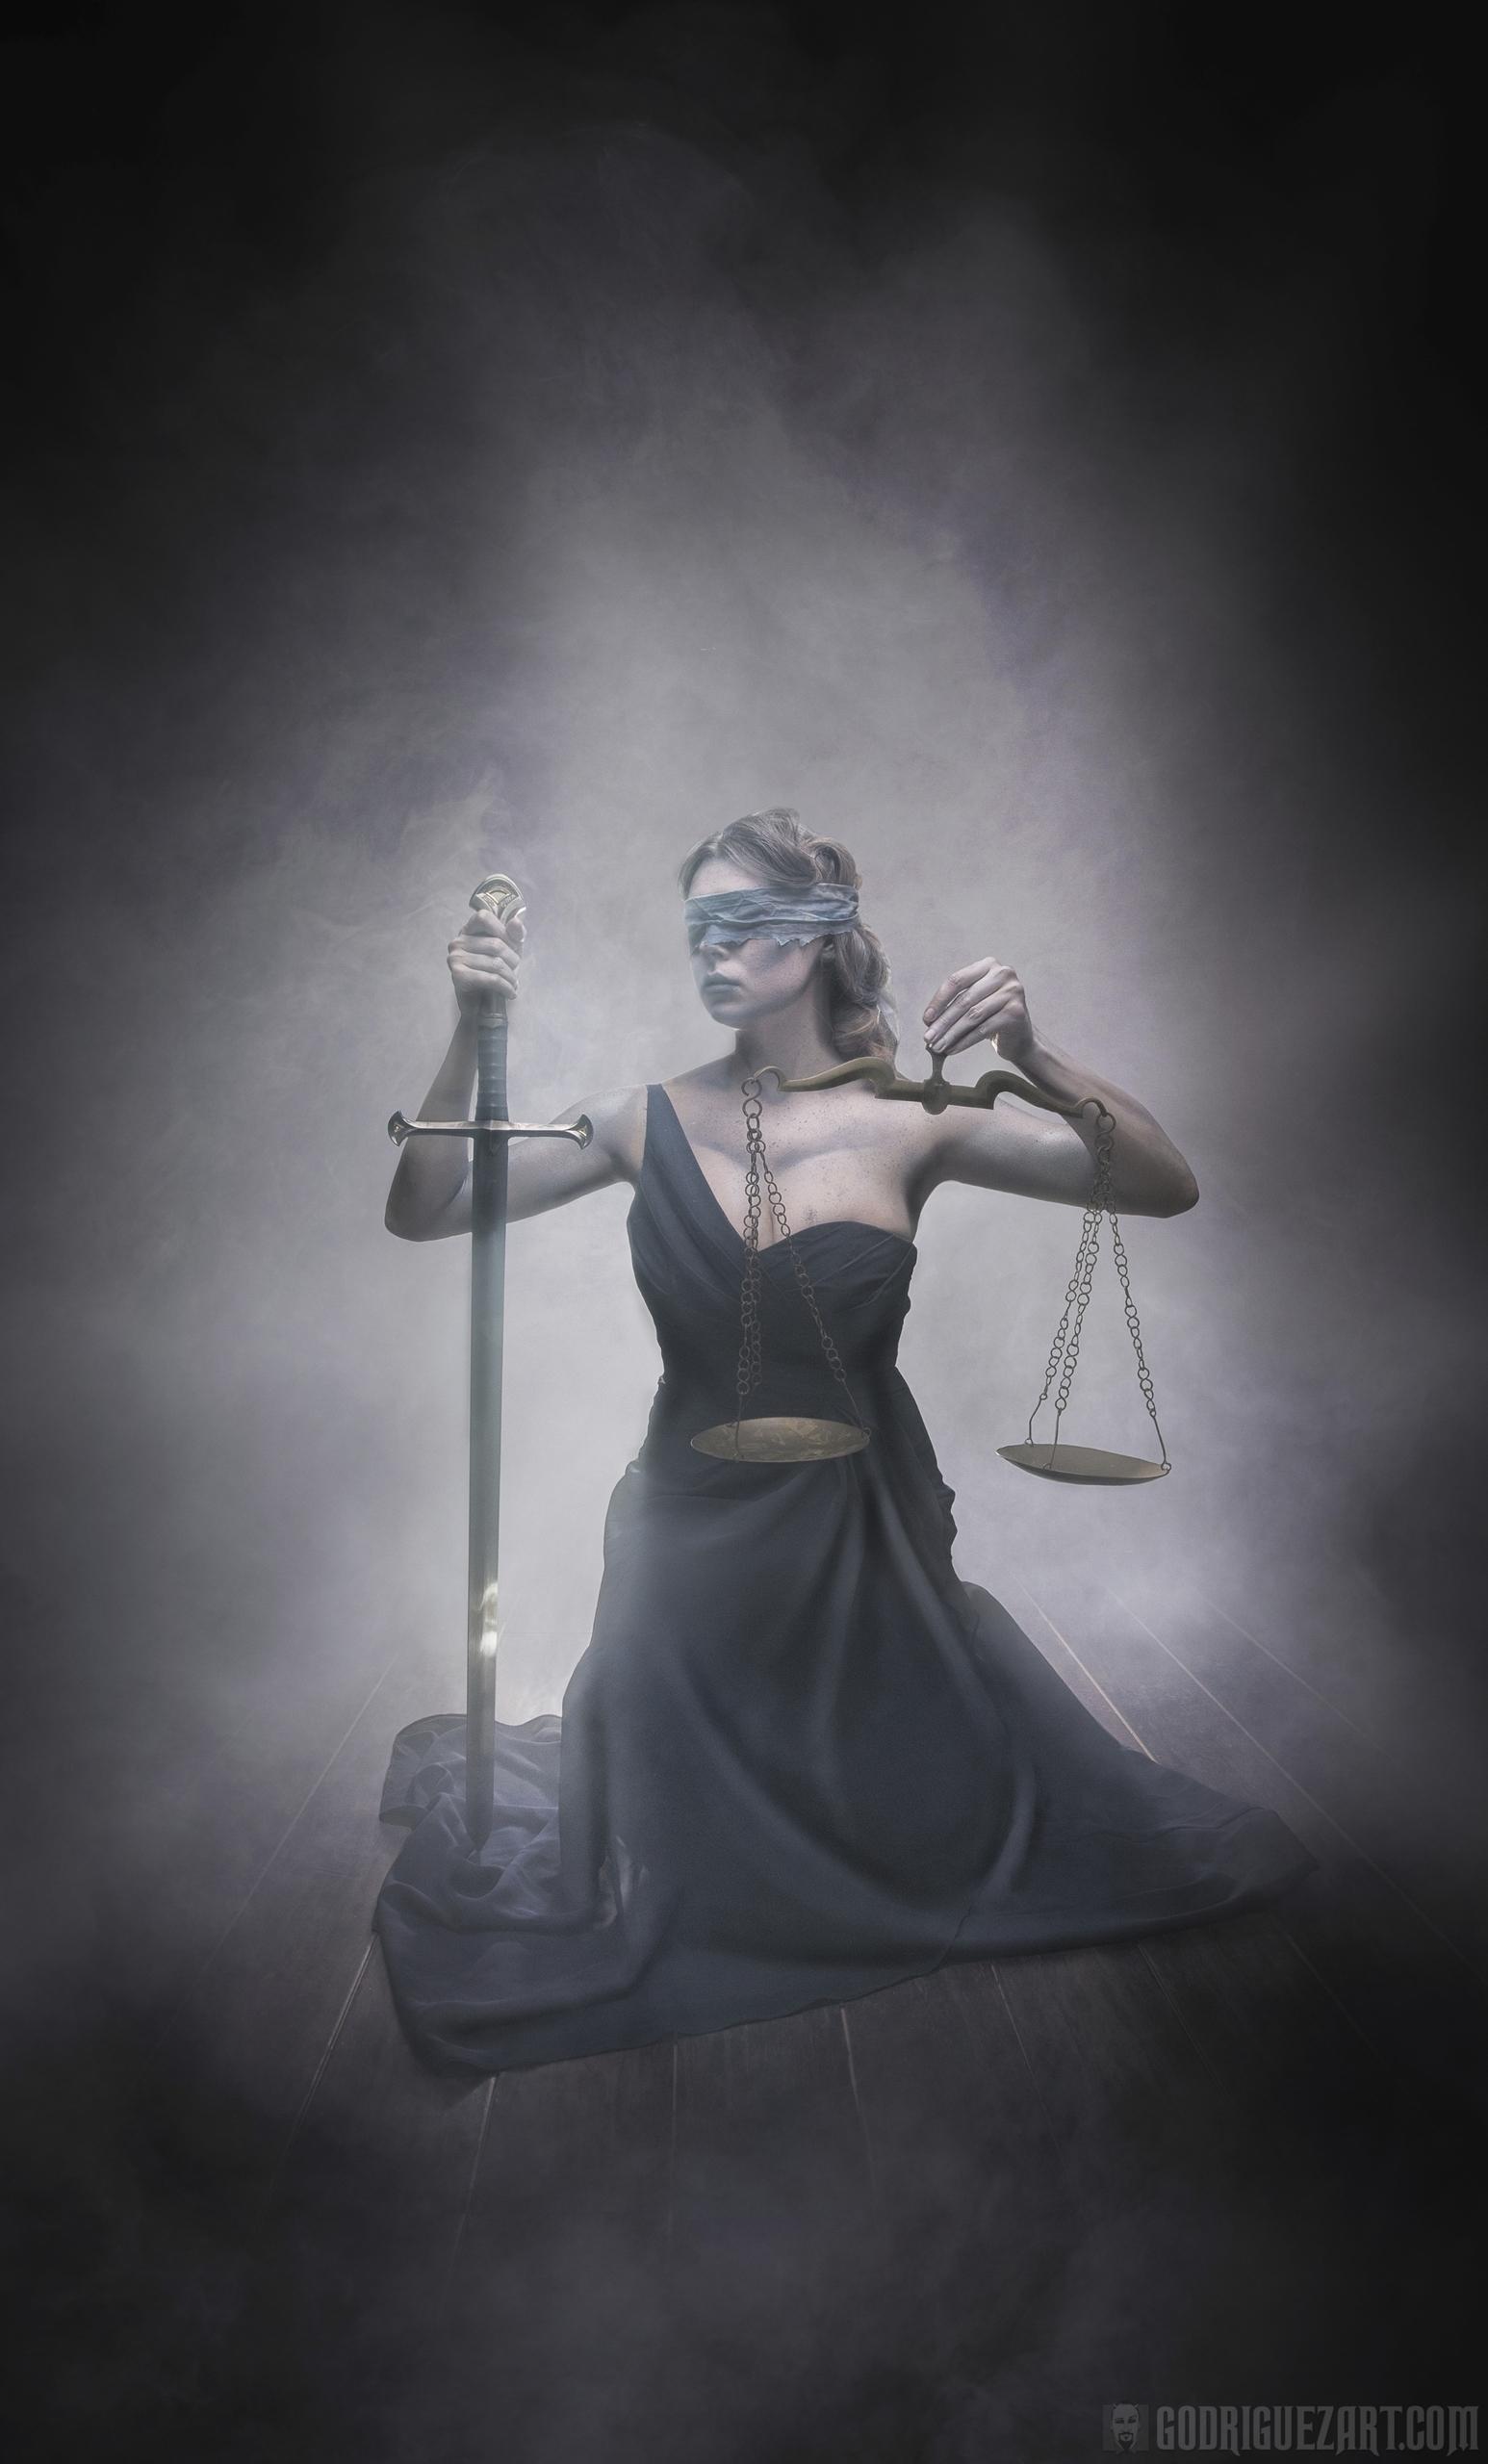 pulling strings, justice bit cr - godriguezart | ello